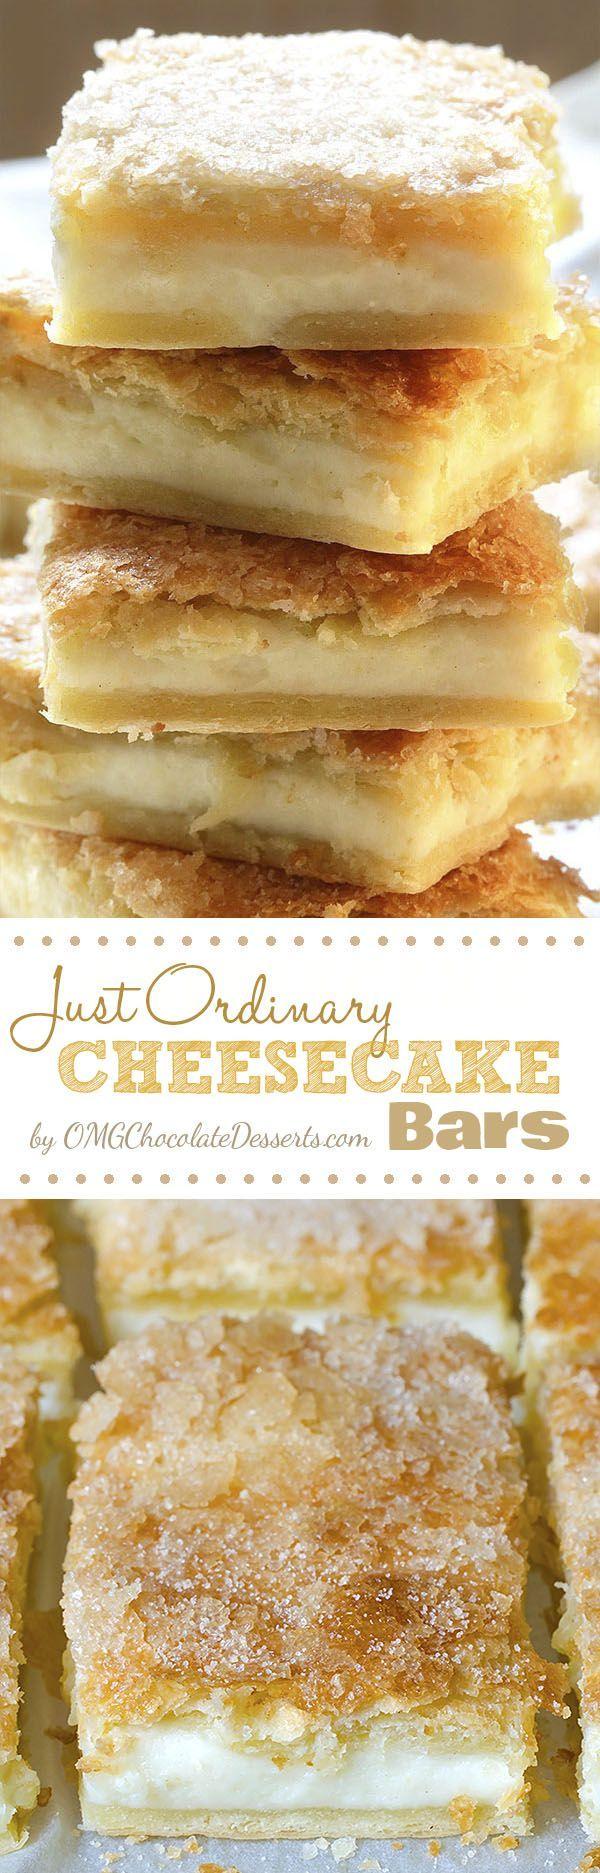 Just Ordinary Cheesecake Bars Recipe Dessert Recipes Dessert Bars How Sweet Eats